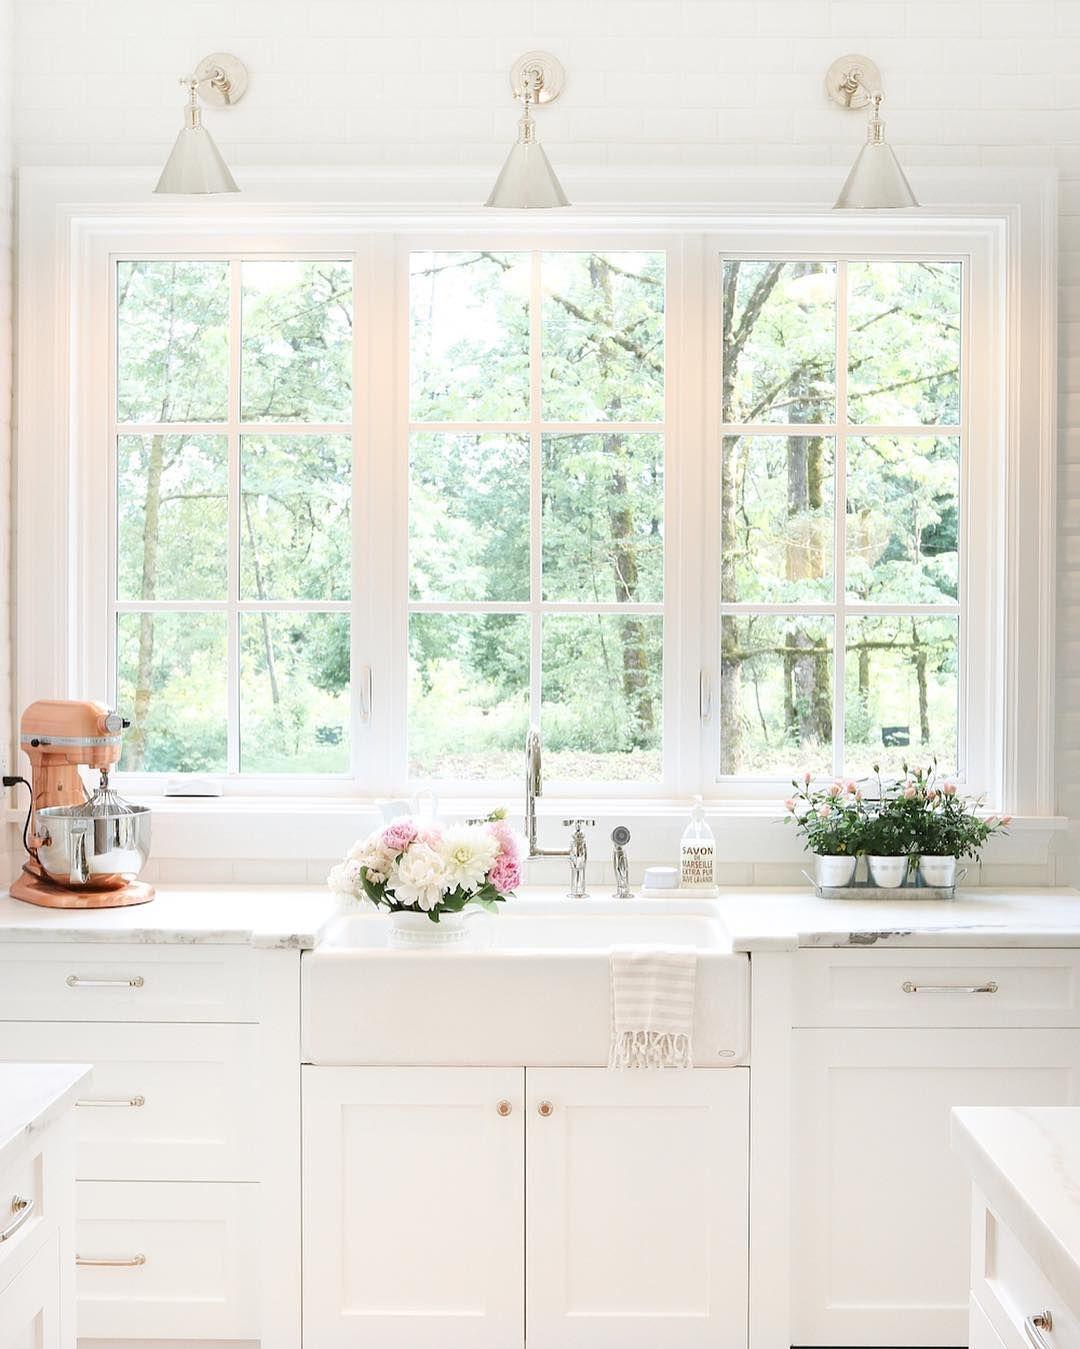 Gorgeous bright kitchen